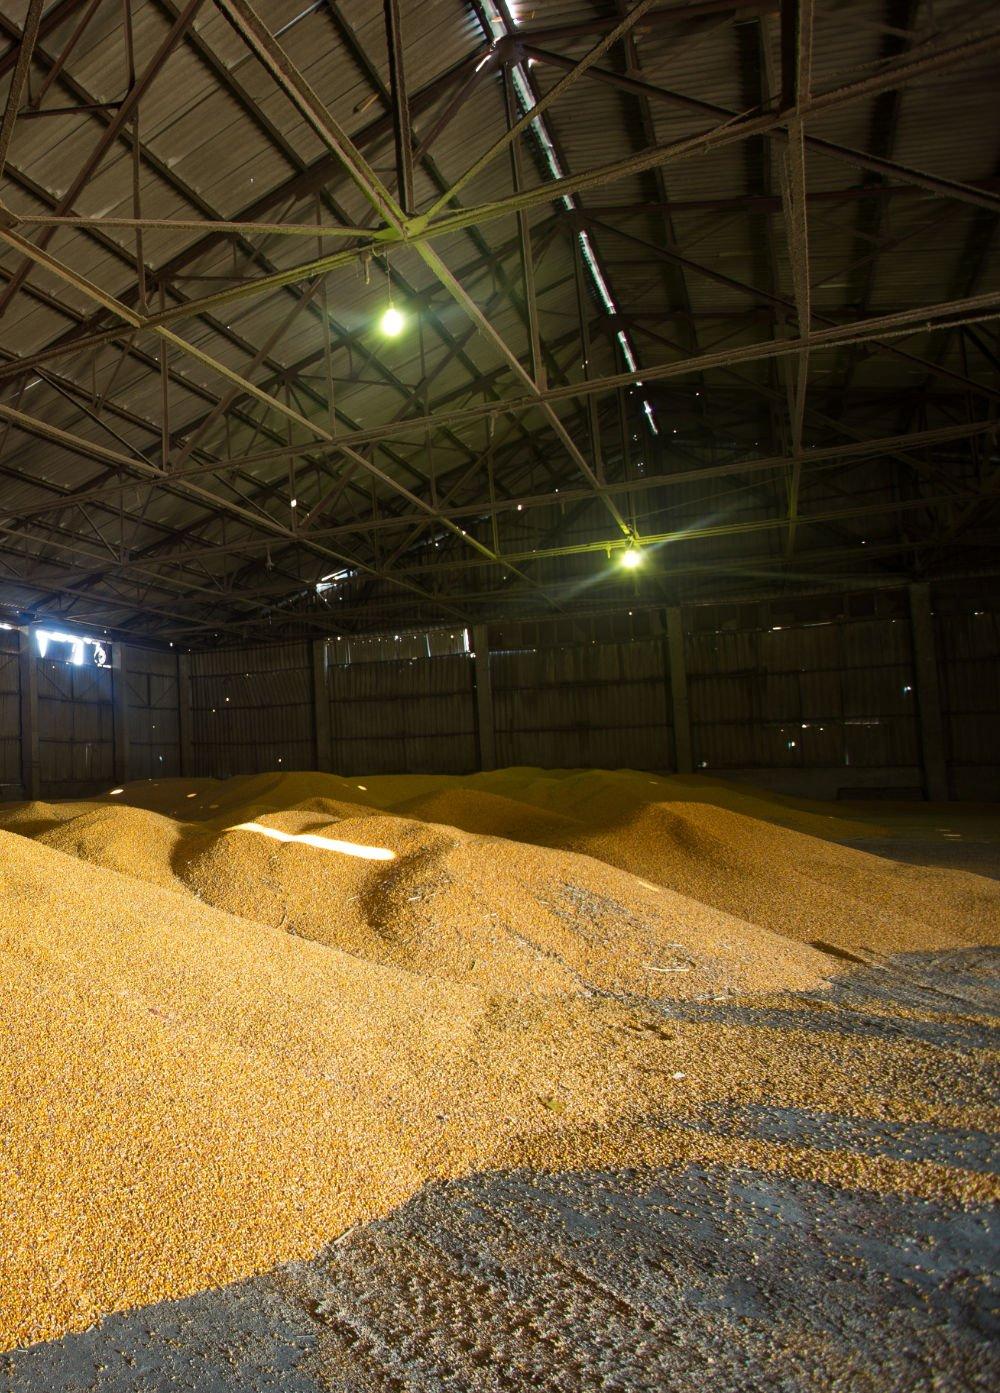 Grain store vertical